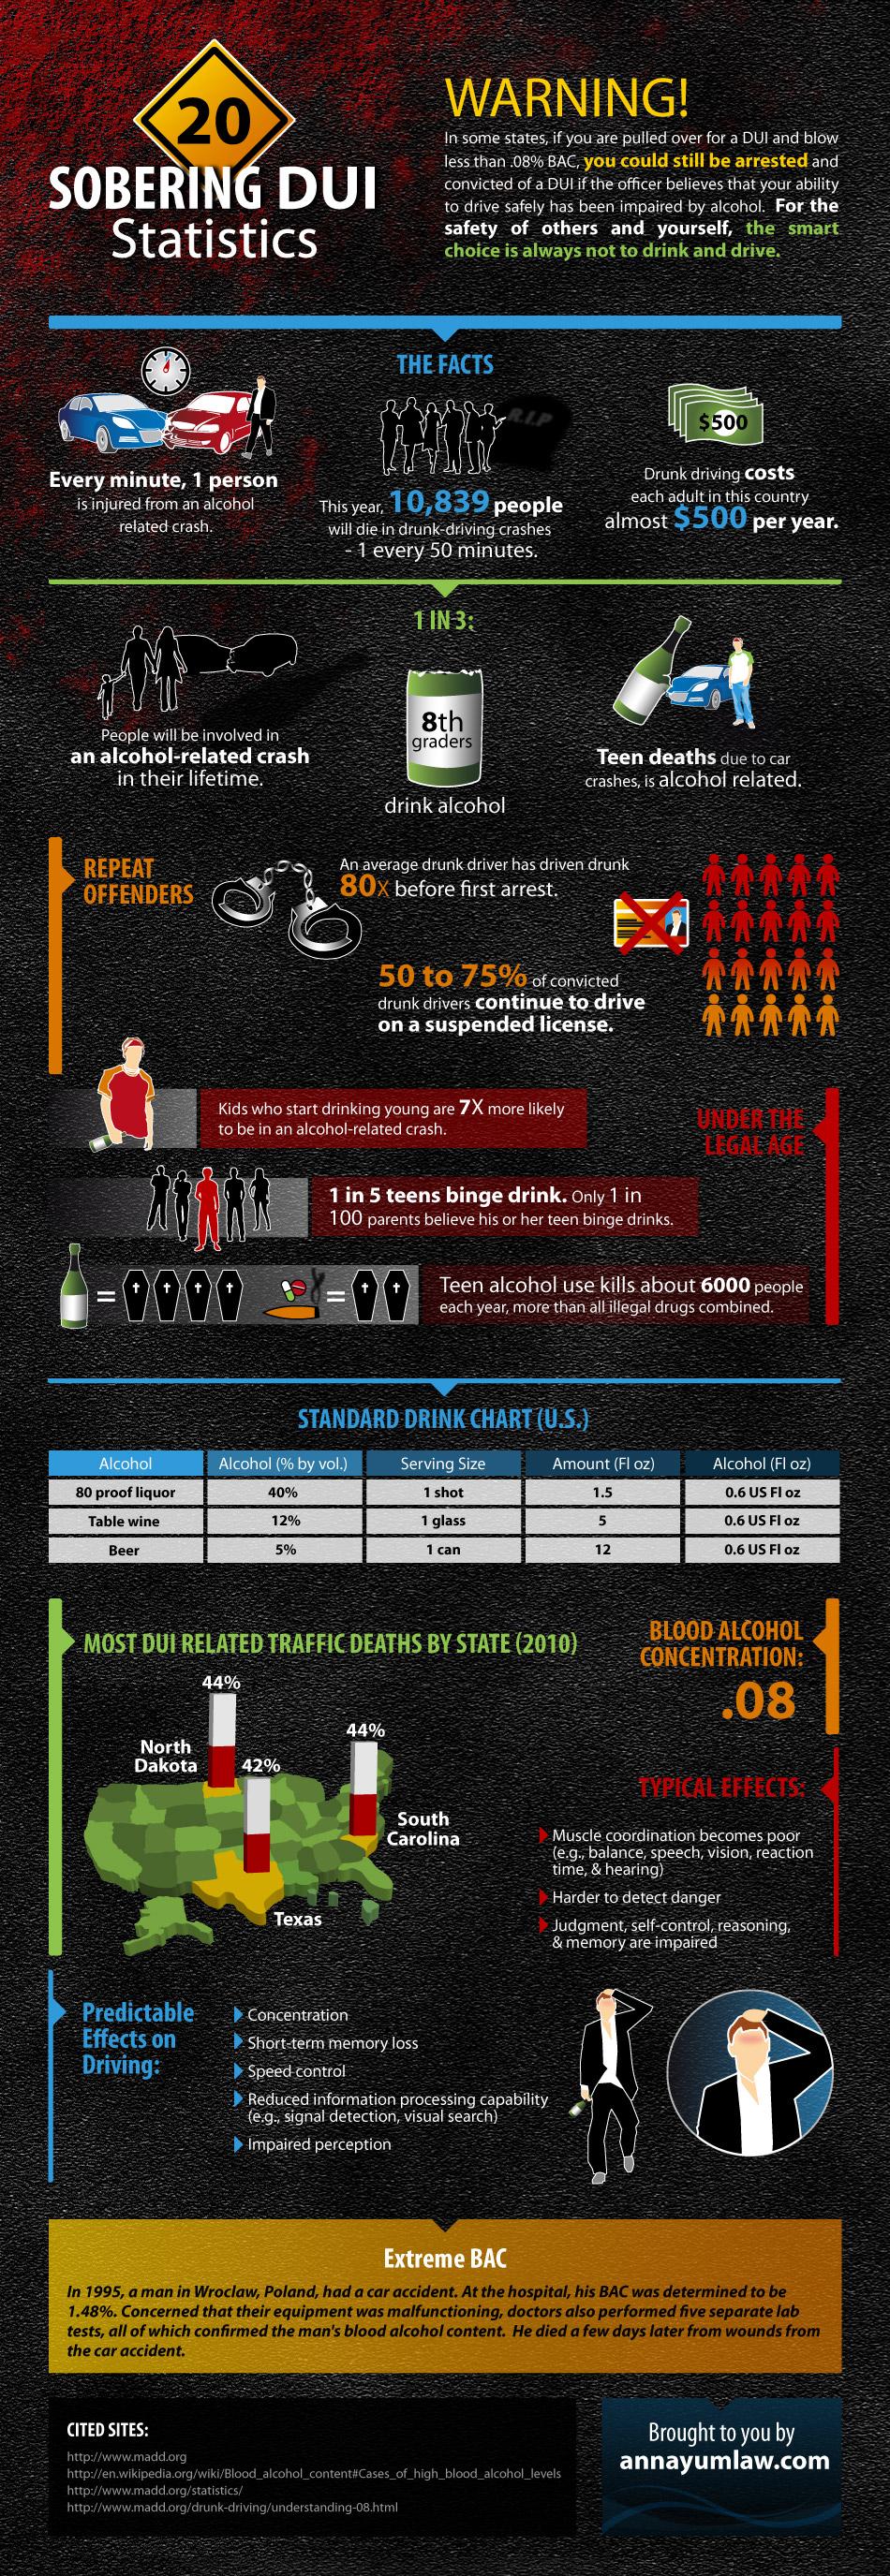 20 Sobering DUI Statistics